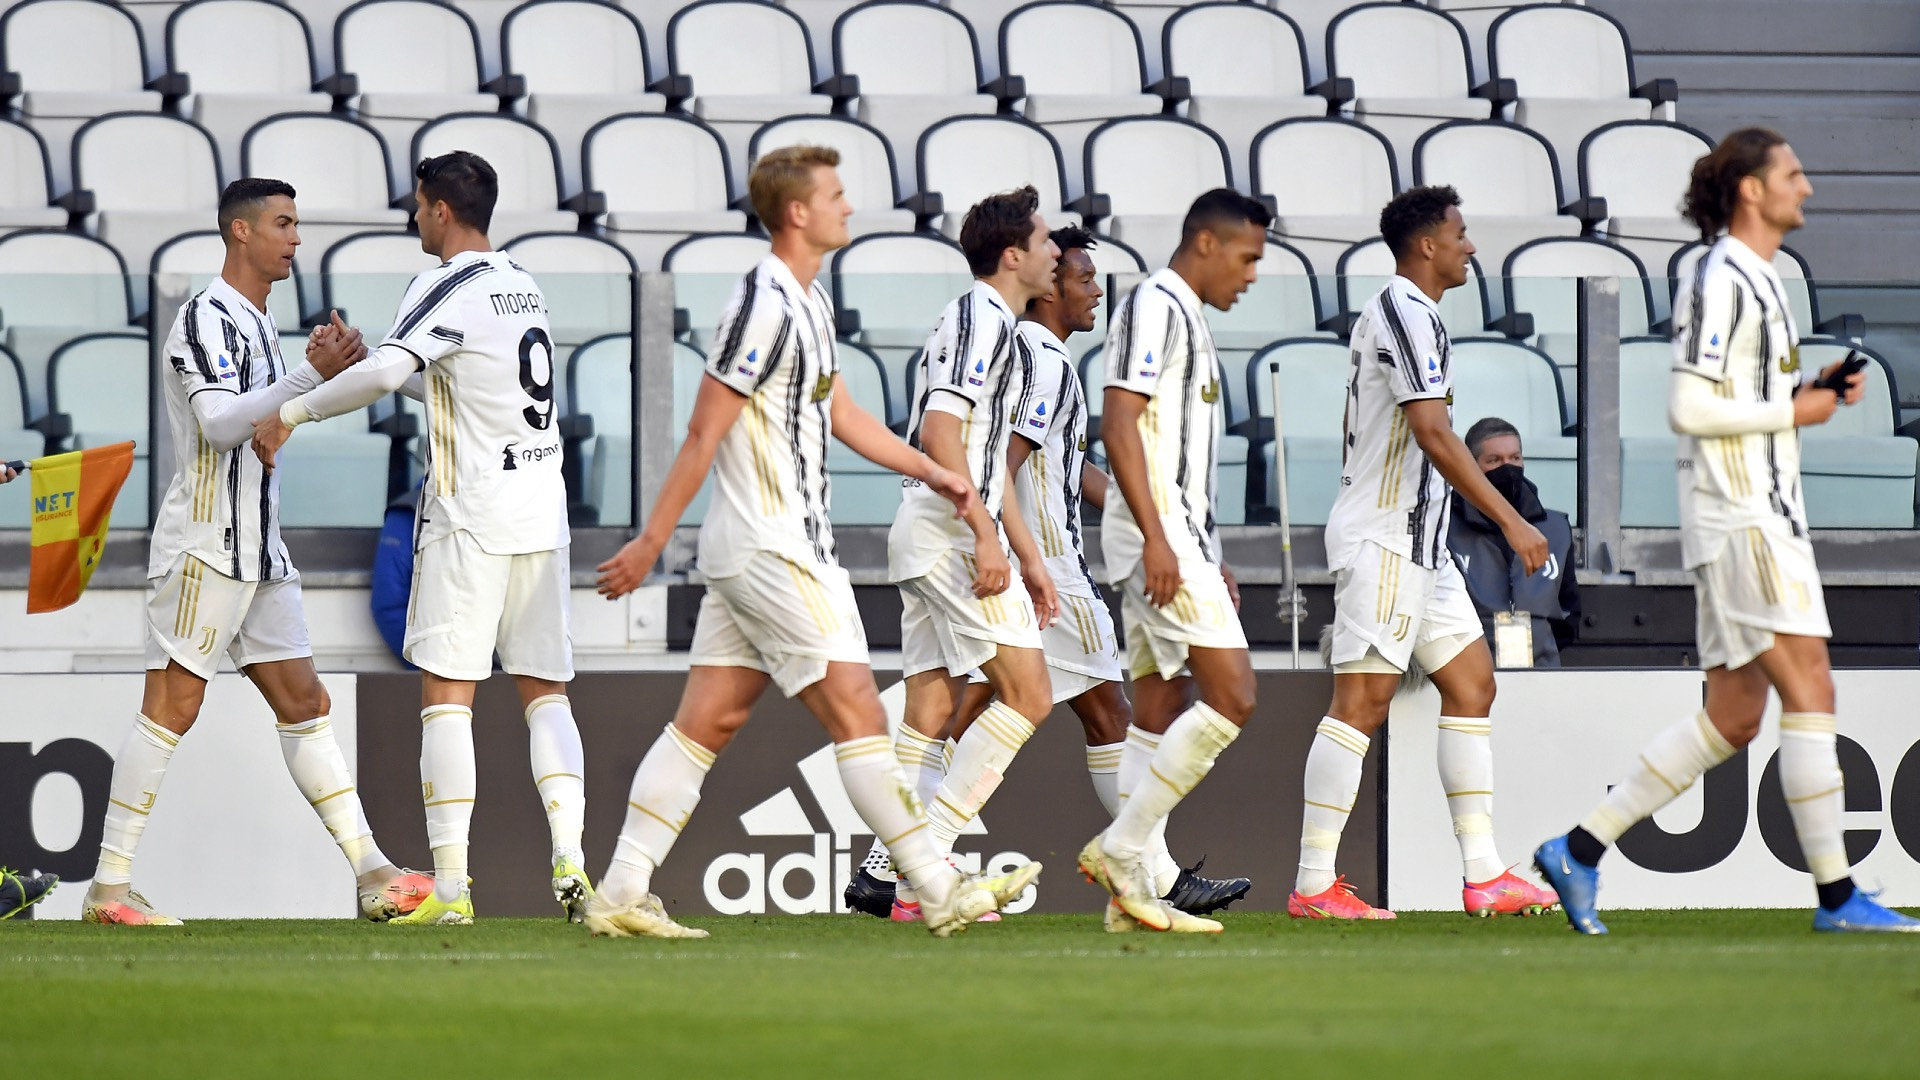 Serie A: Juventus – Napoli 2 – 1, le foto - Serie A: Juventus - Napoli 2 - 1,  le foto   Virgilio Sport